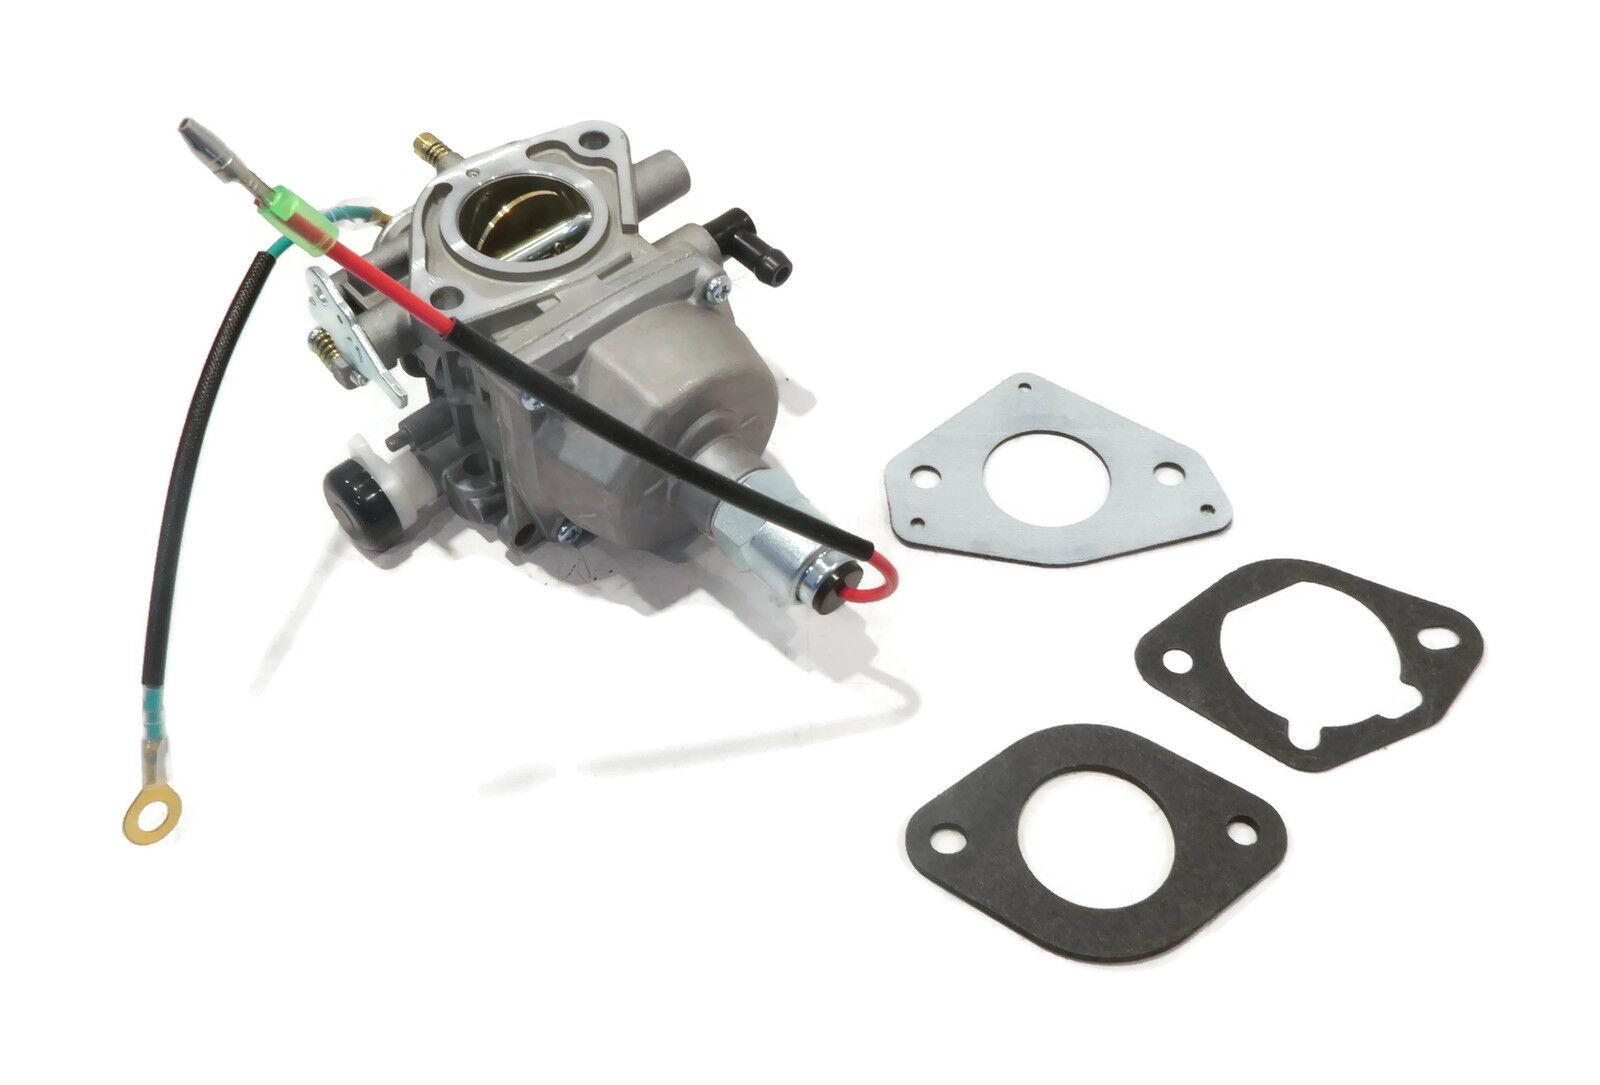 Cocheburador Cocheburador se Ajusta Kohler Motor SV740-0011 SV740-0012 SV740-0013 SV740-0014